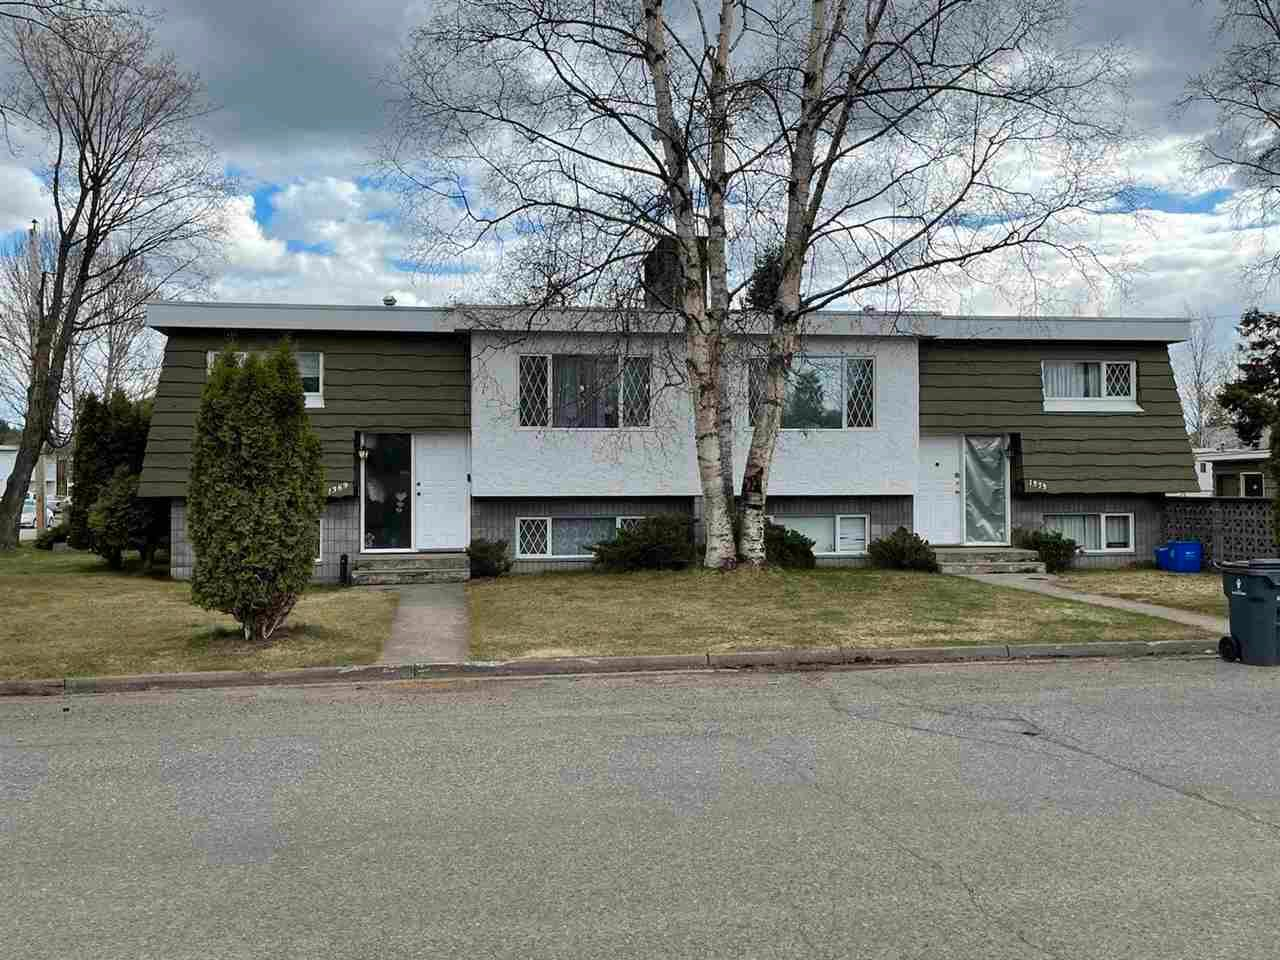 Main Photo: 1369 - 1373 PORTER Avenue in Prince George: VLA Duplex for sale (PG City Central (Zone 72))  : MLS®# R2576934